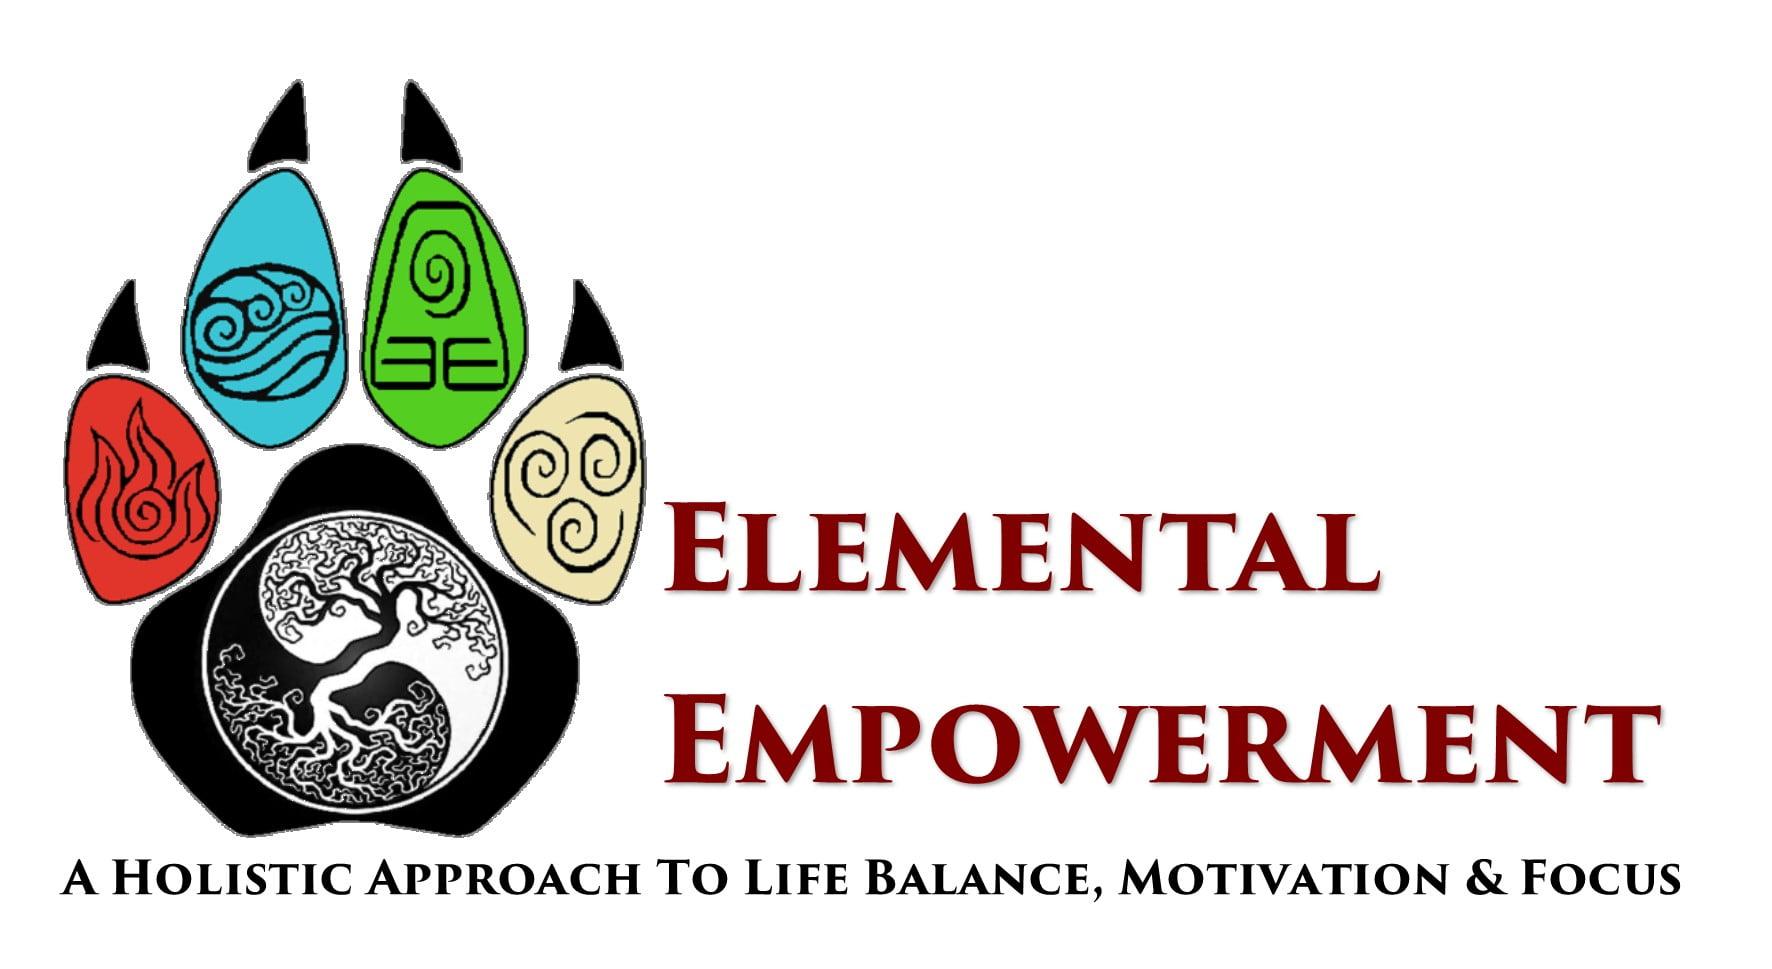 Elemental Empowerment